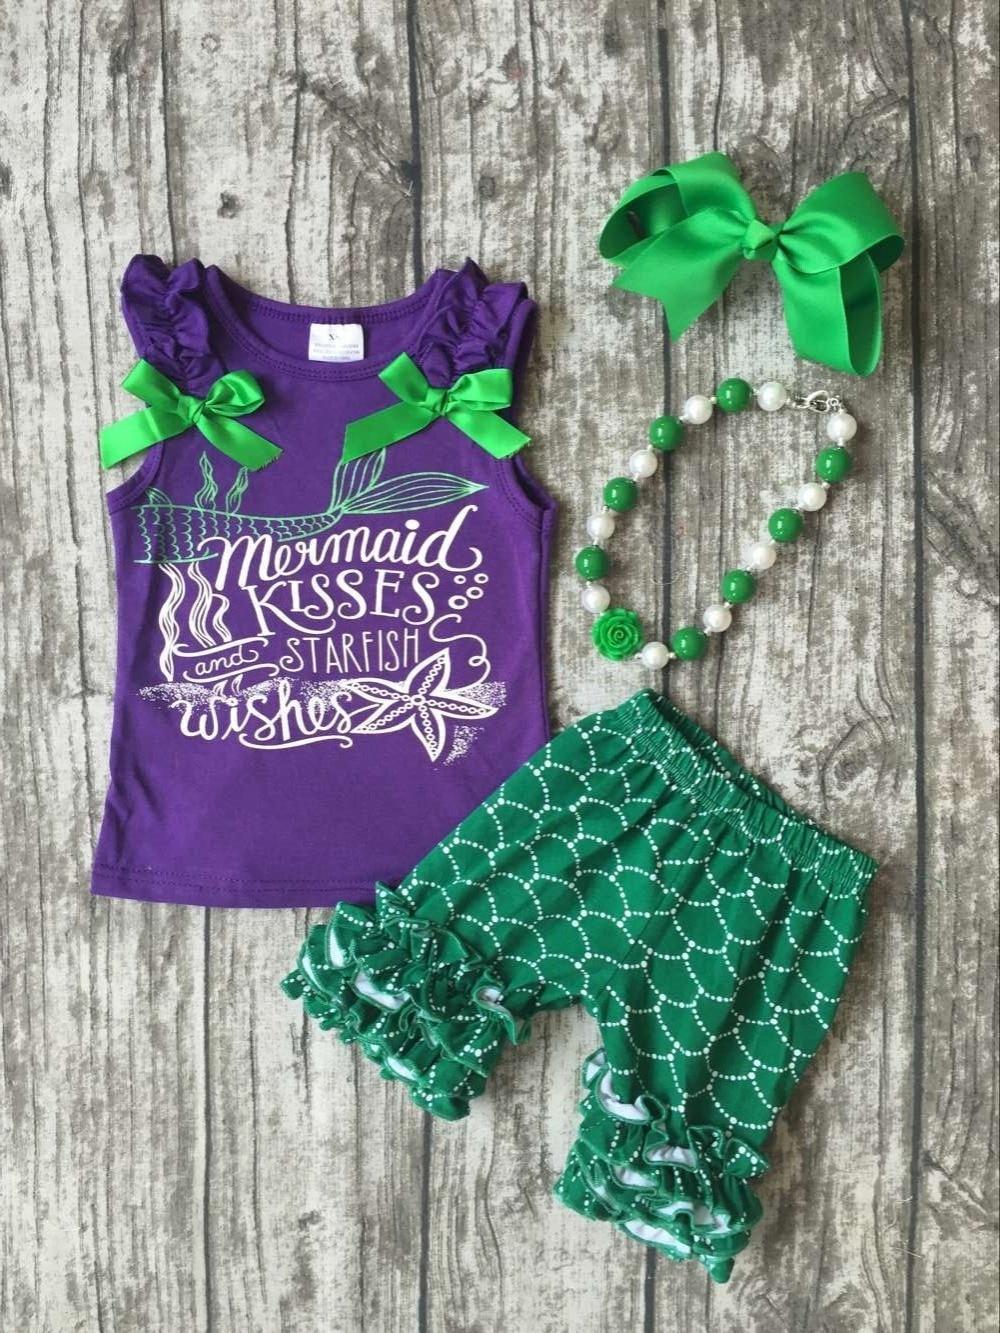 Baby Girls Summer Clothes Mermaid Kisses Starfish Wishes Outfits Baby Girls Mermaid Summer